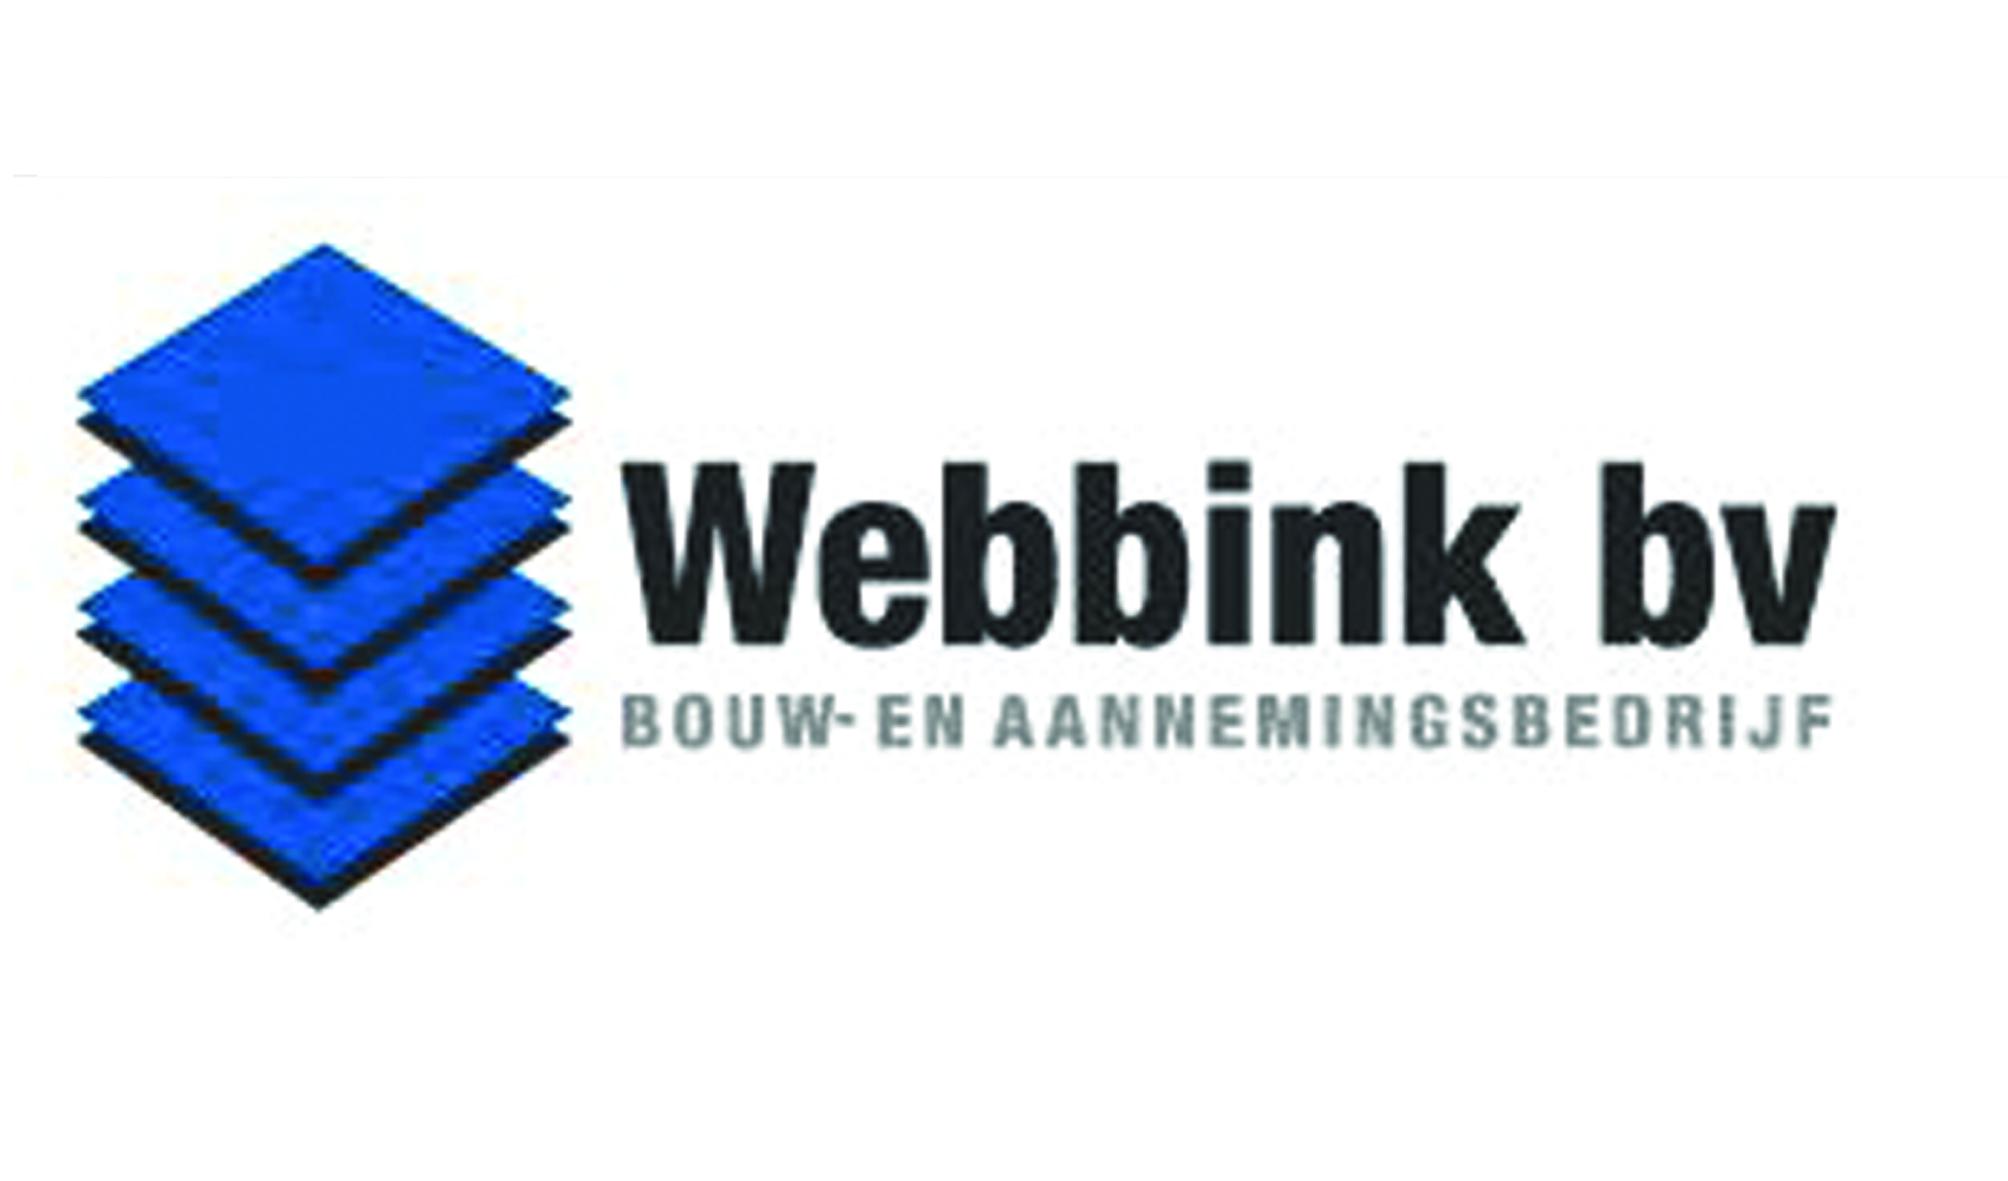 Aannemersbedrijf Webbink